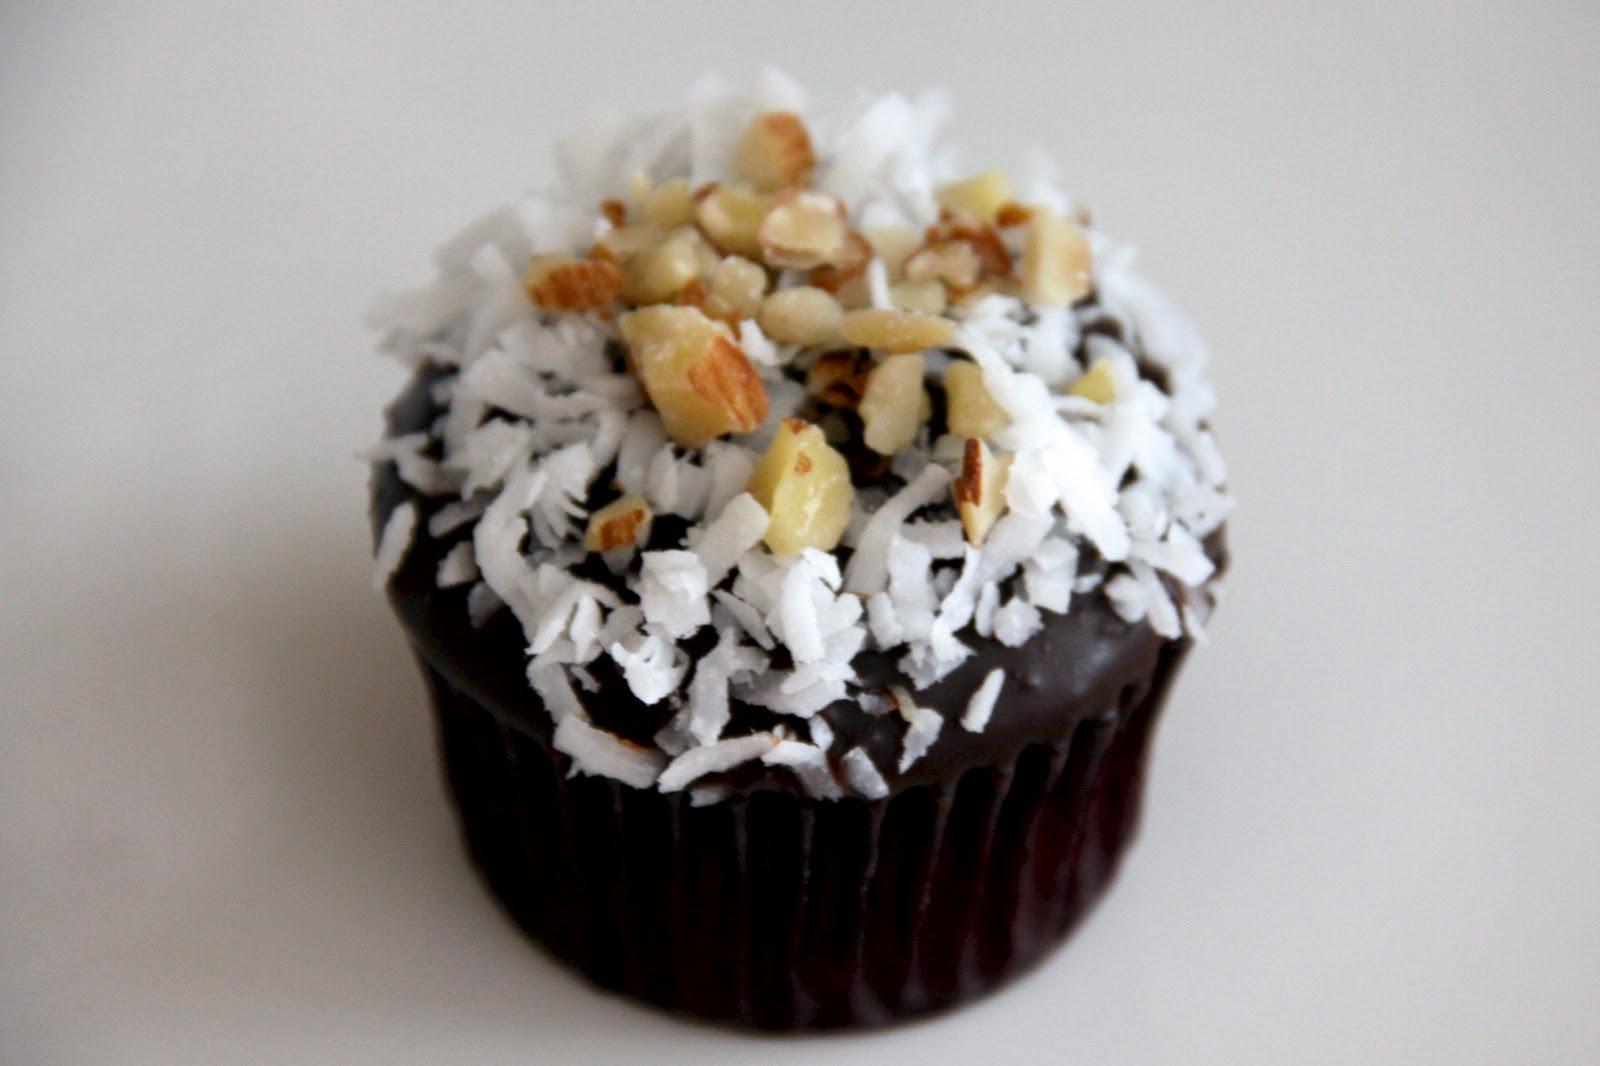 ... Cupcakes%2C+Los+Angeles+Cupcakes%2C+Coconut+Cupcakes%2C+Almond